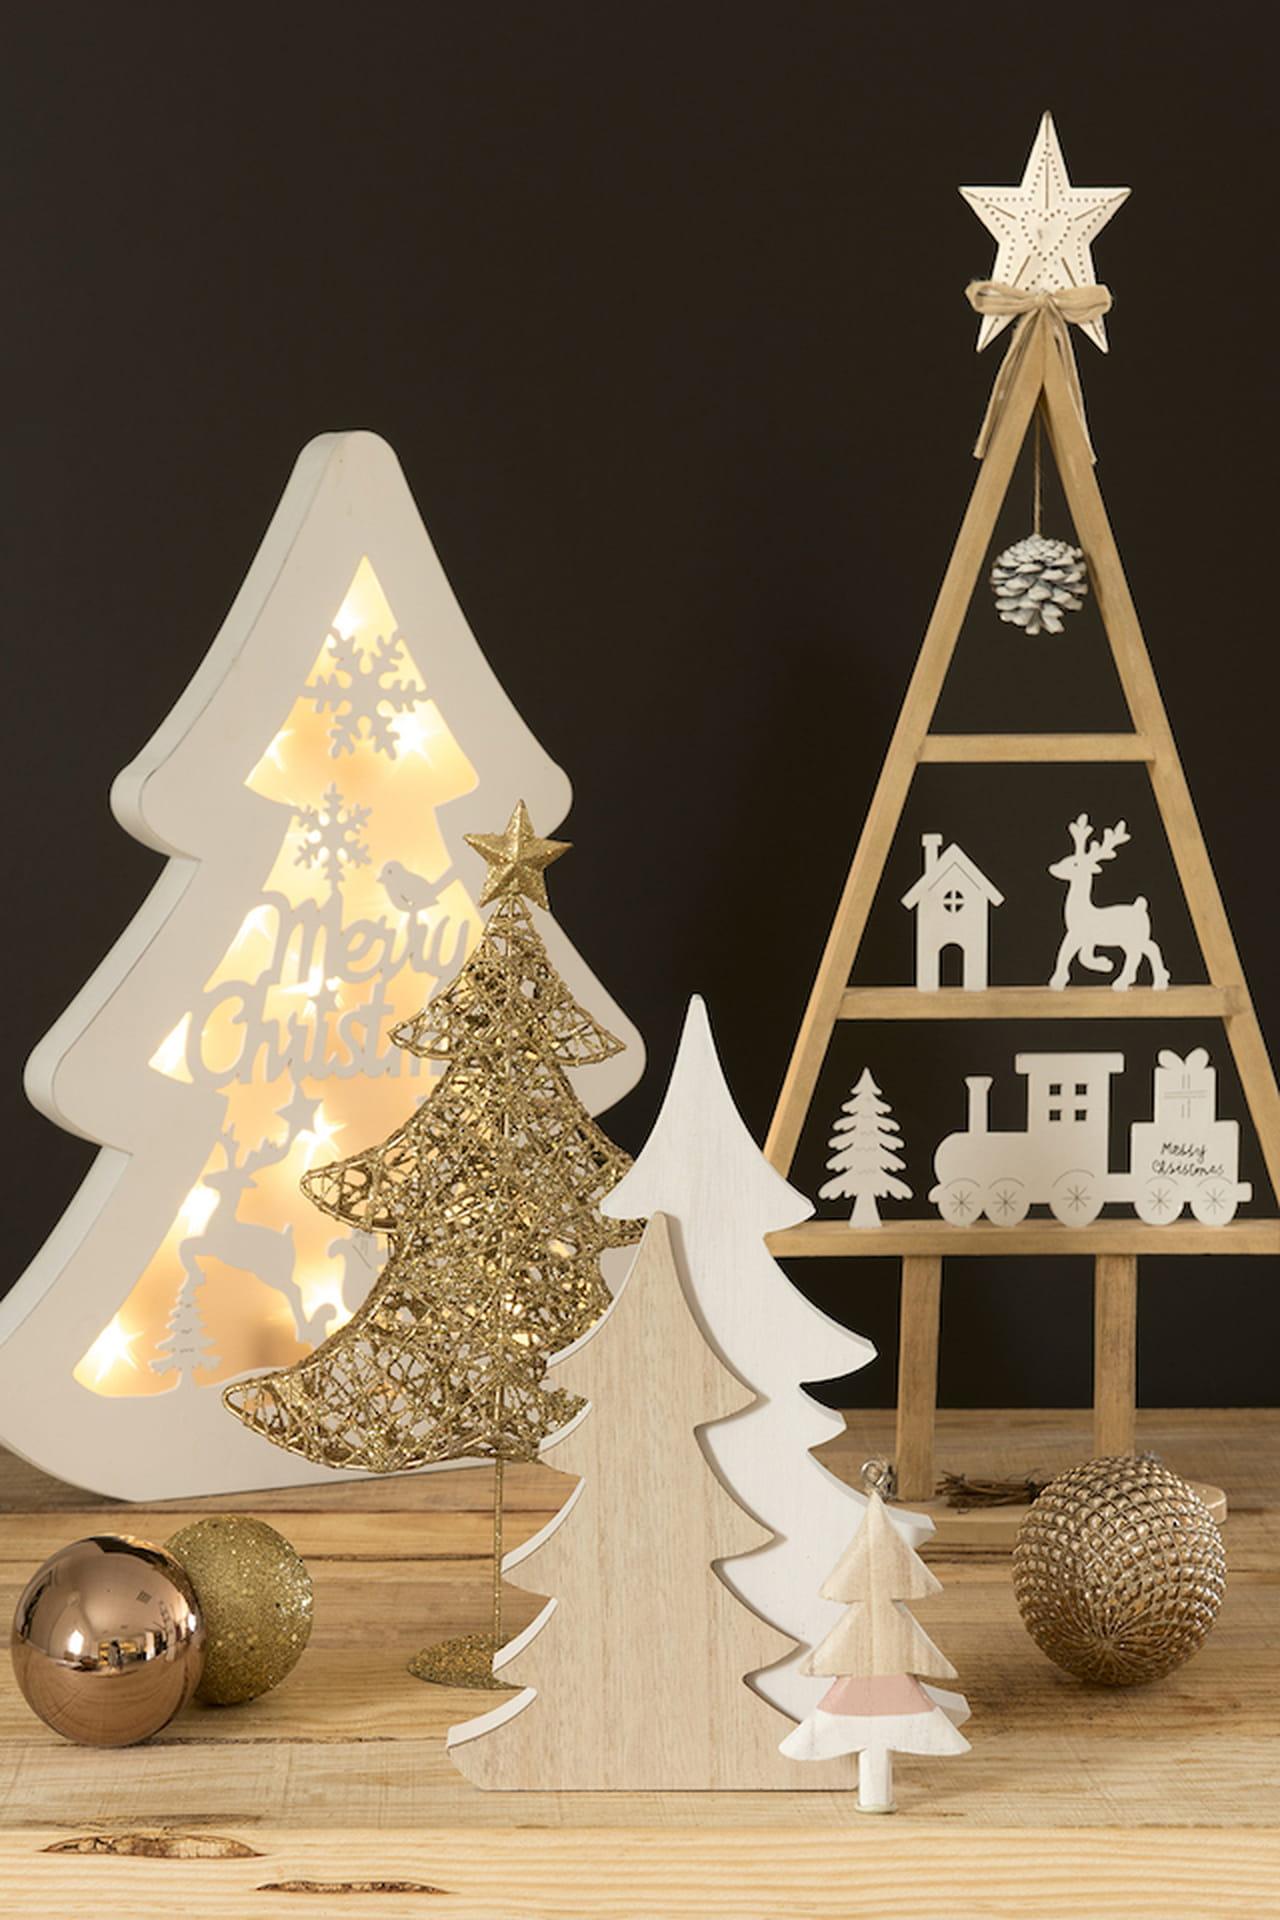 Addobbi natalizi 2016 shopping per una casa in festa for Tovaglie natalizie ikea